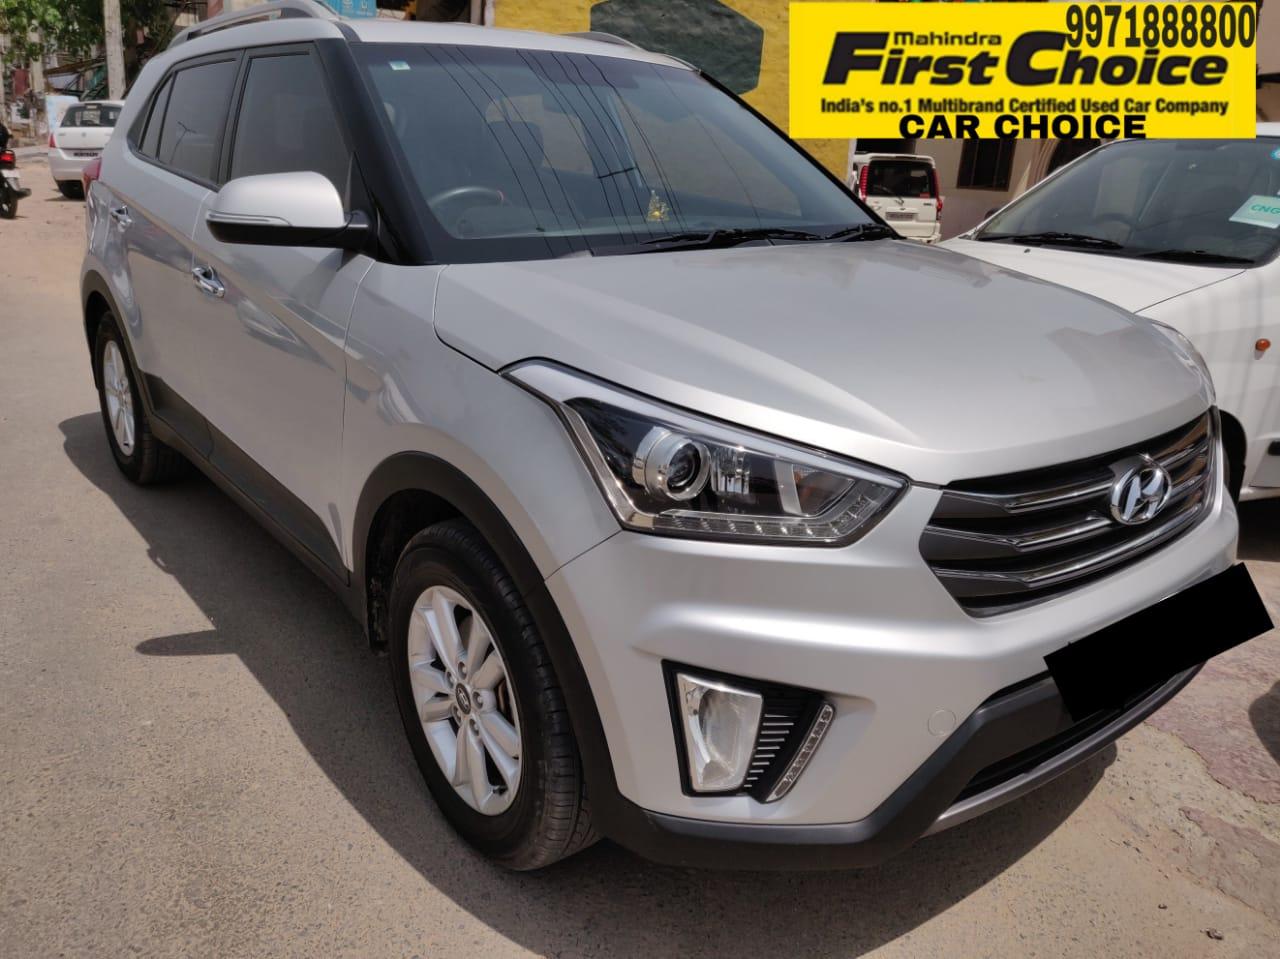 Used Hyundai Creta In Delhi Mahindra First Choice